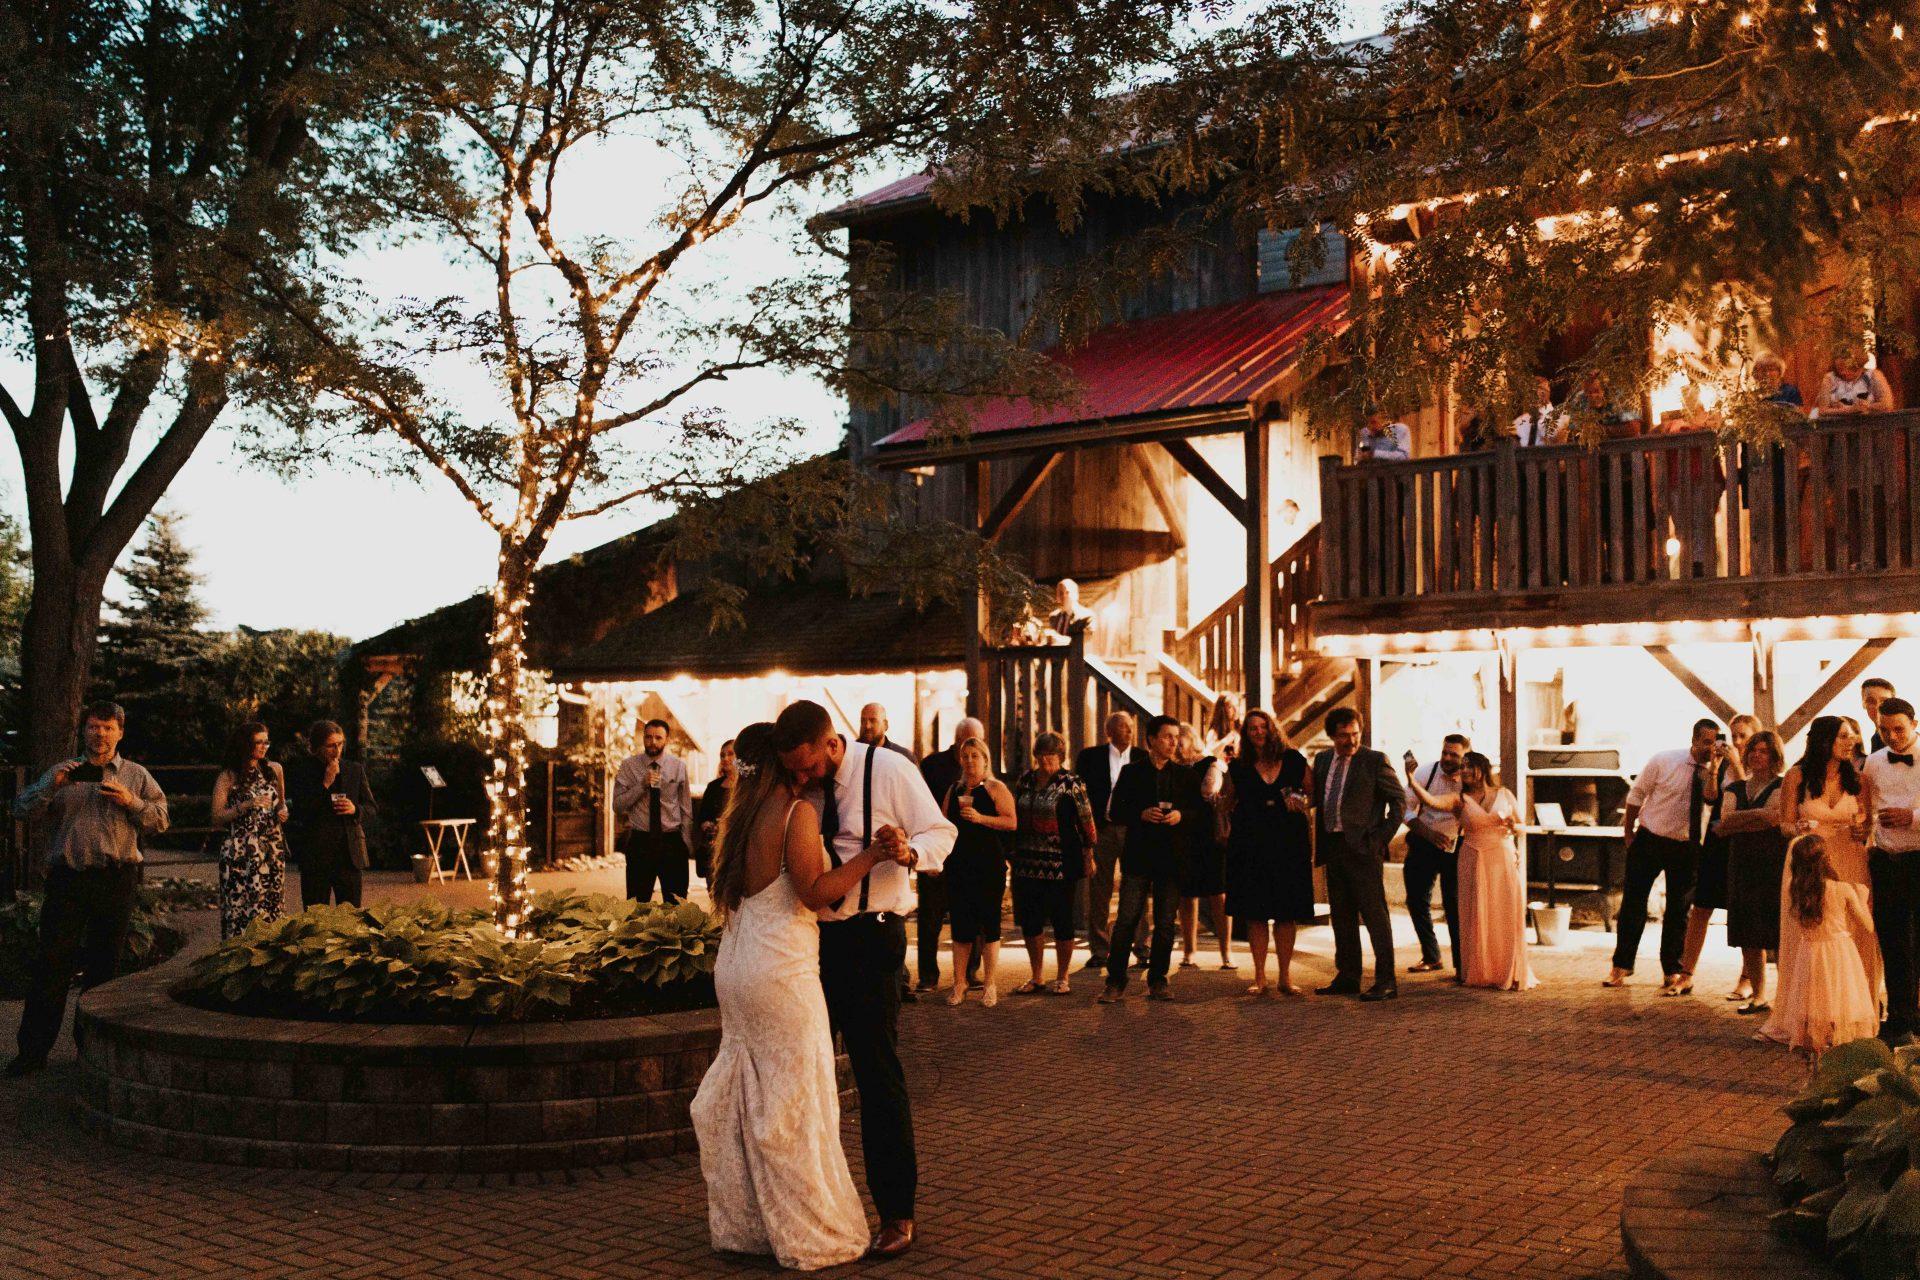 Belcroft estate barn wedding